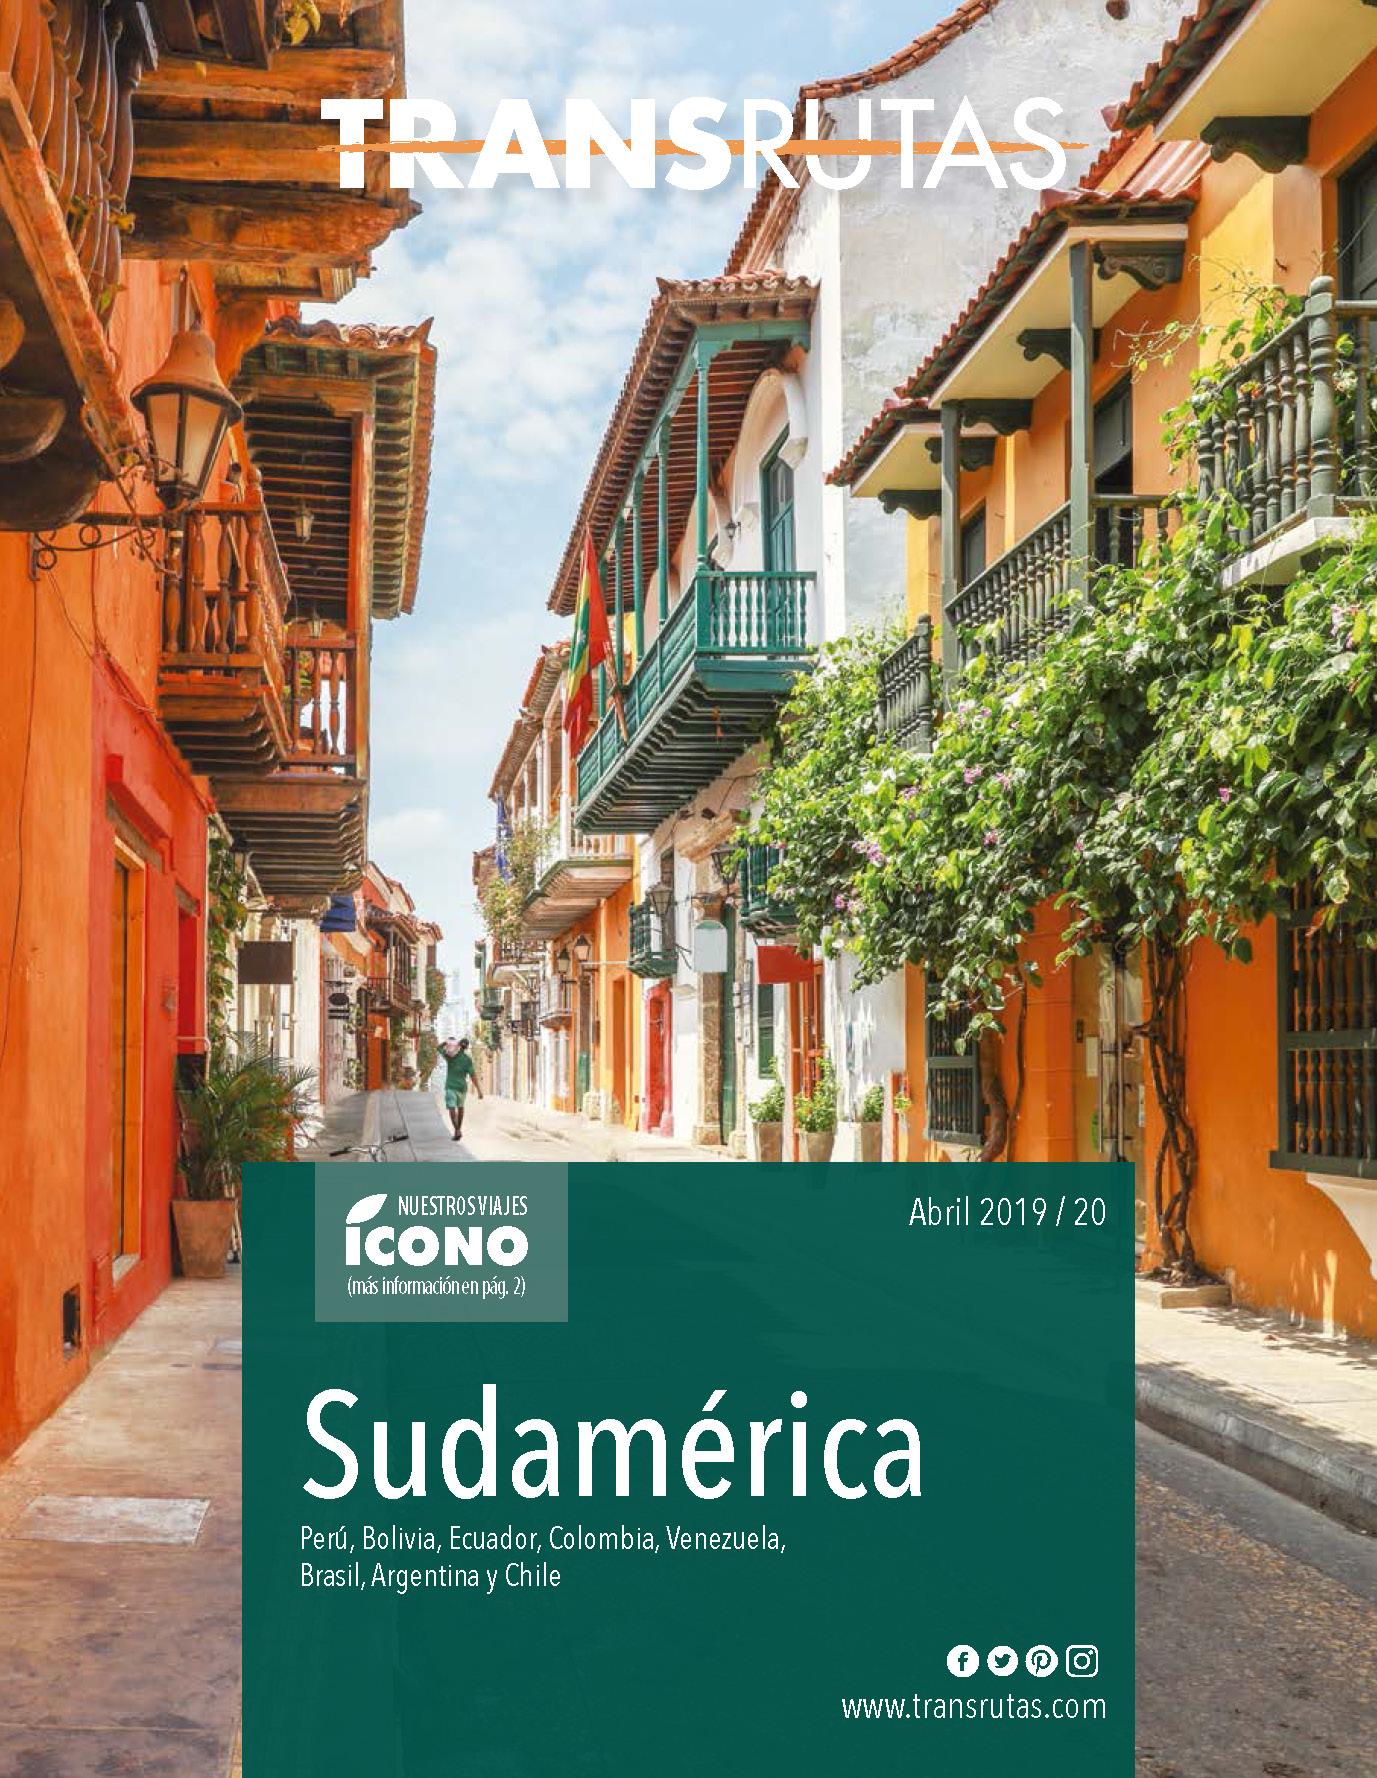 Catalogo Transrutas Sudamerica 2019-2020